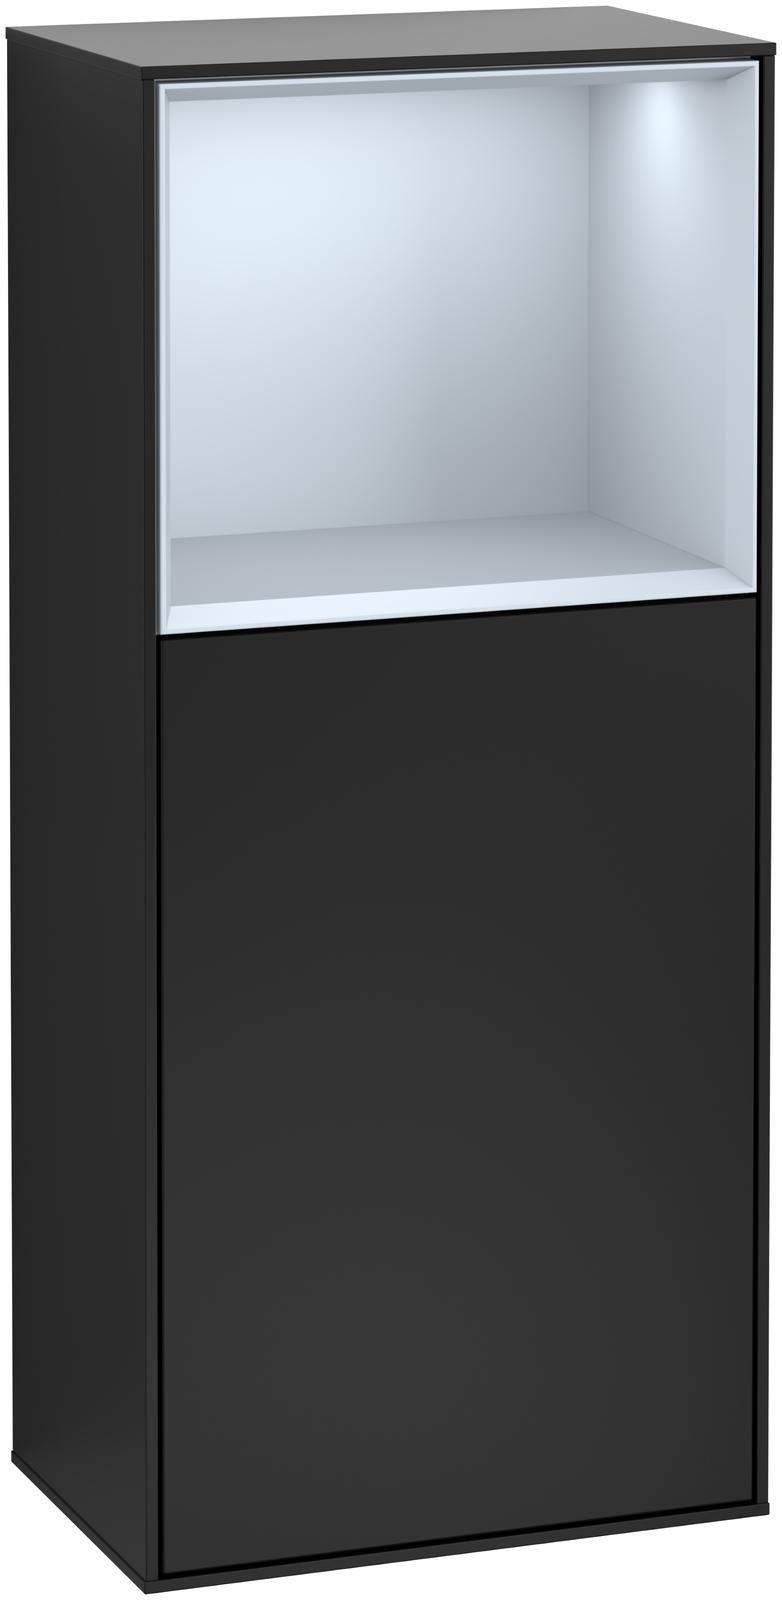 Villeroy & Boch Finion G52 Seitenschrank mit Regalelement 1 Tür Anschlag links LED-Beleuchtung B:41,8xH:93,6xT:27cm Front, Korpus: Black Matt Lacquer, Regal: Cloud G520HAPD